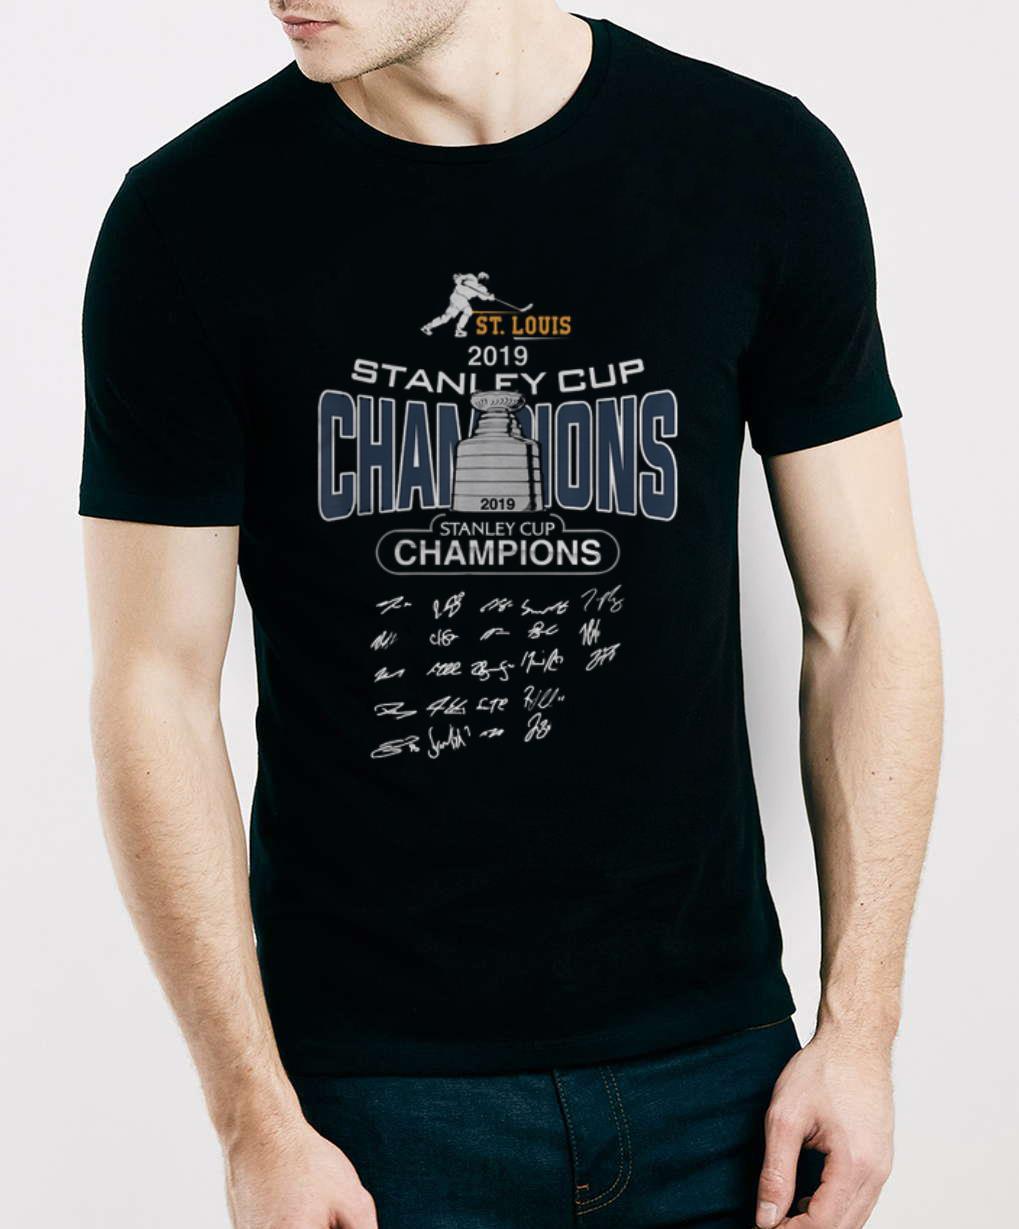 Official St Louis Champions 2019 Signature Shirt 3 1.jpg